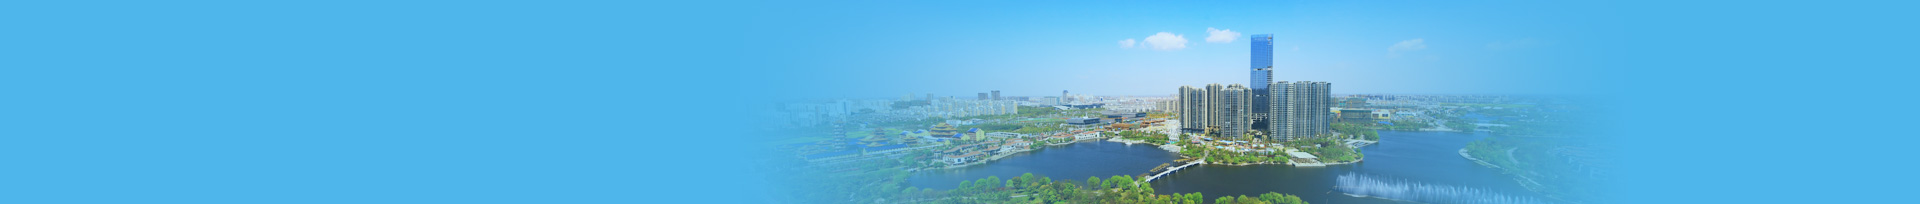 Nantong National Hightech Industrial Development Zone